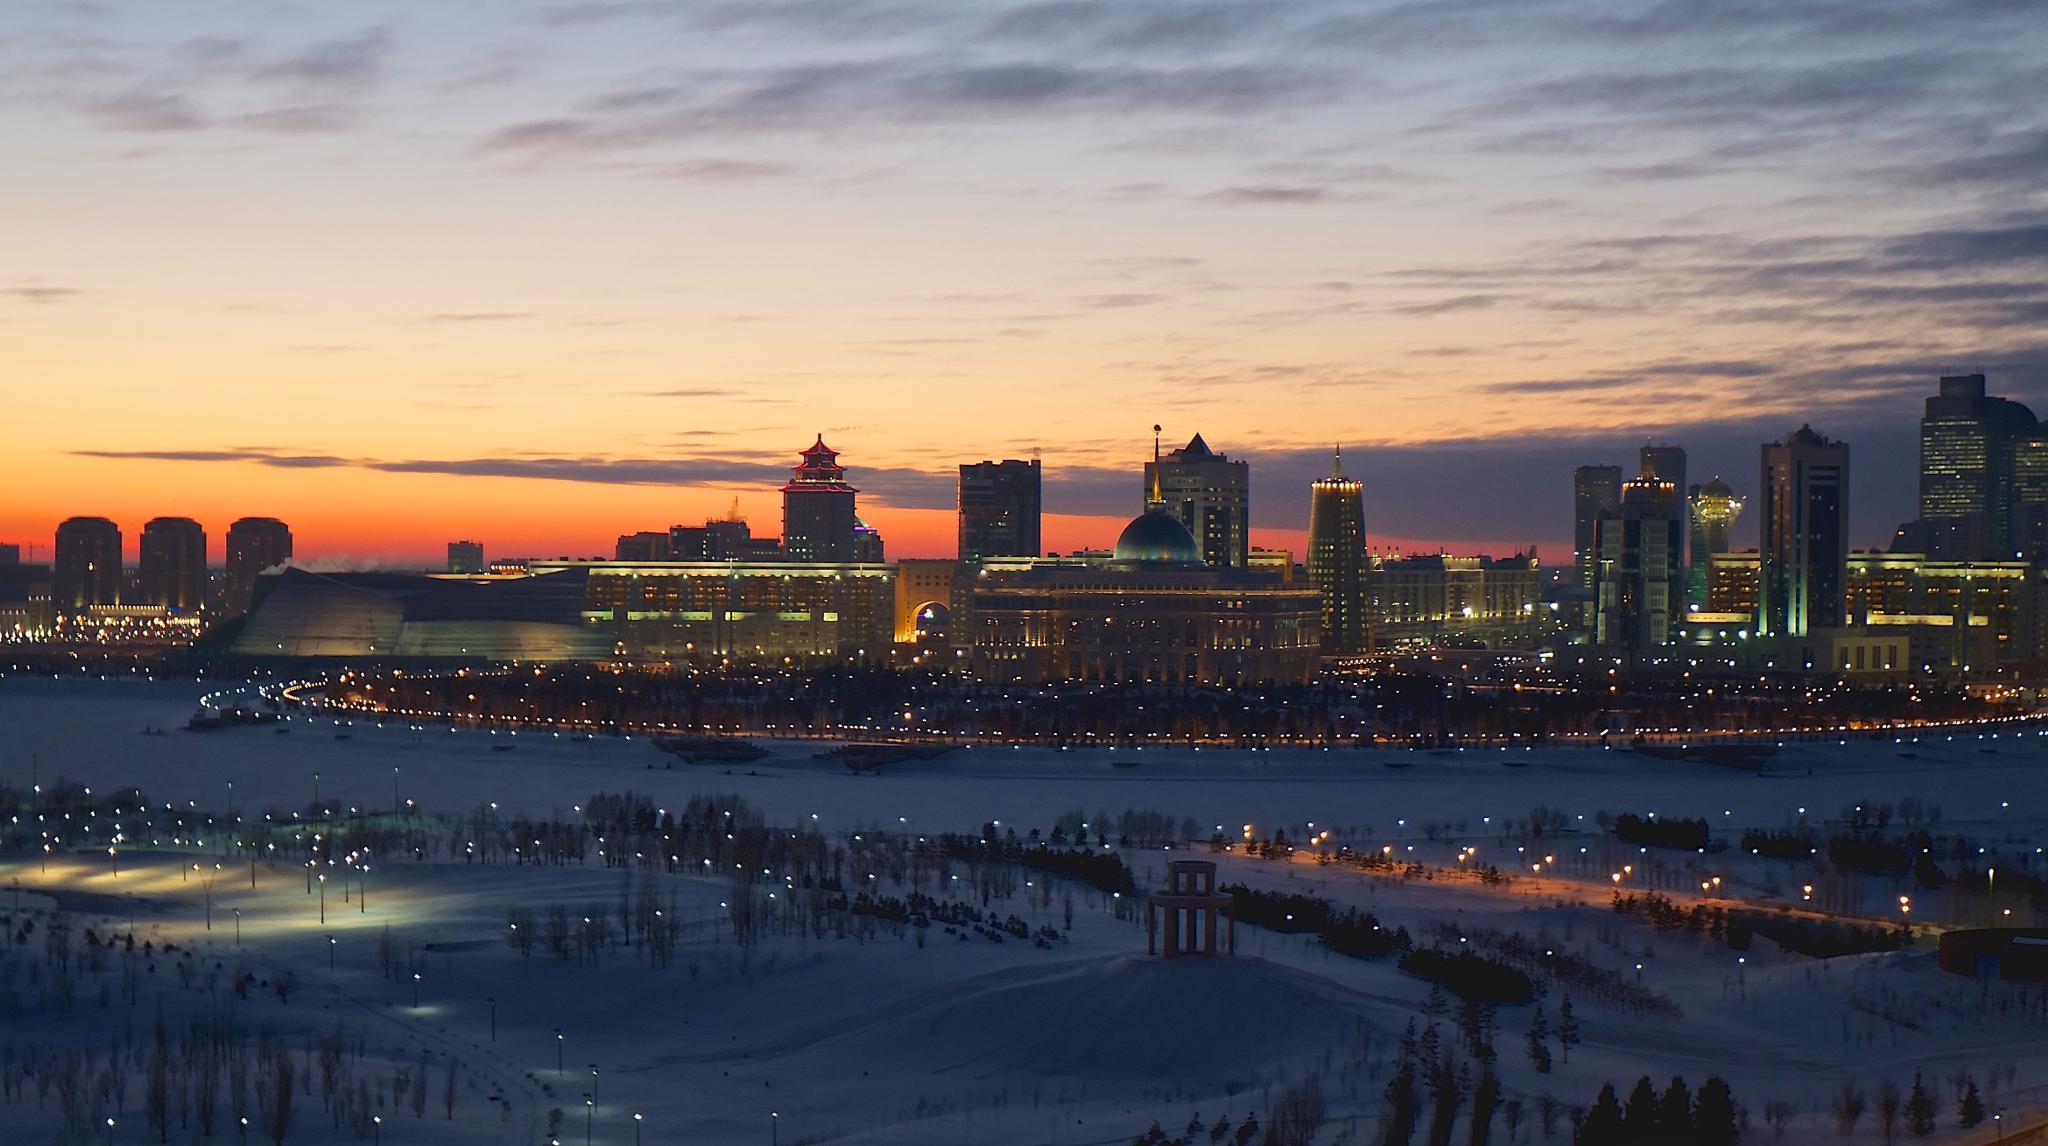 Astana twilight by alexandre duarte